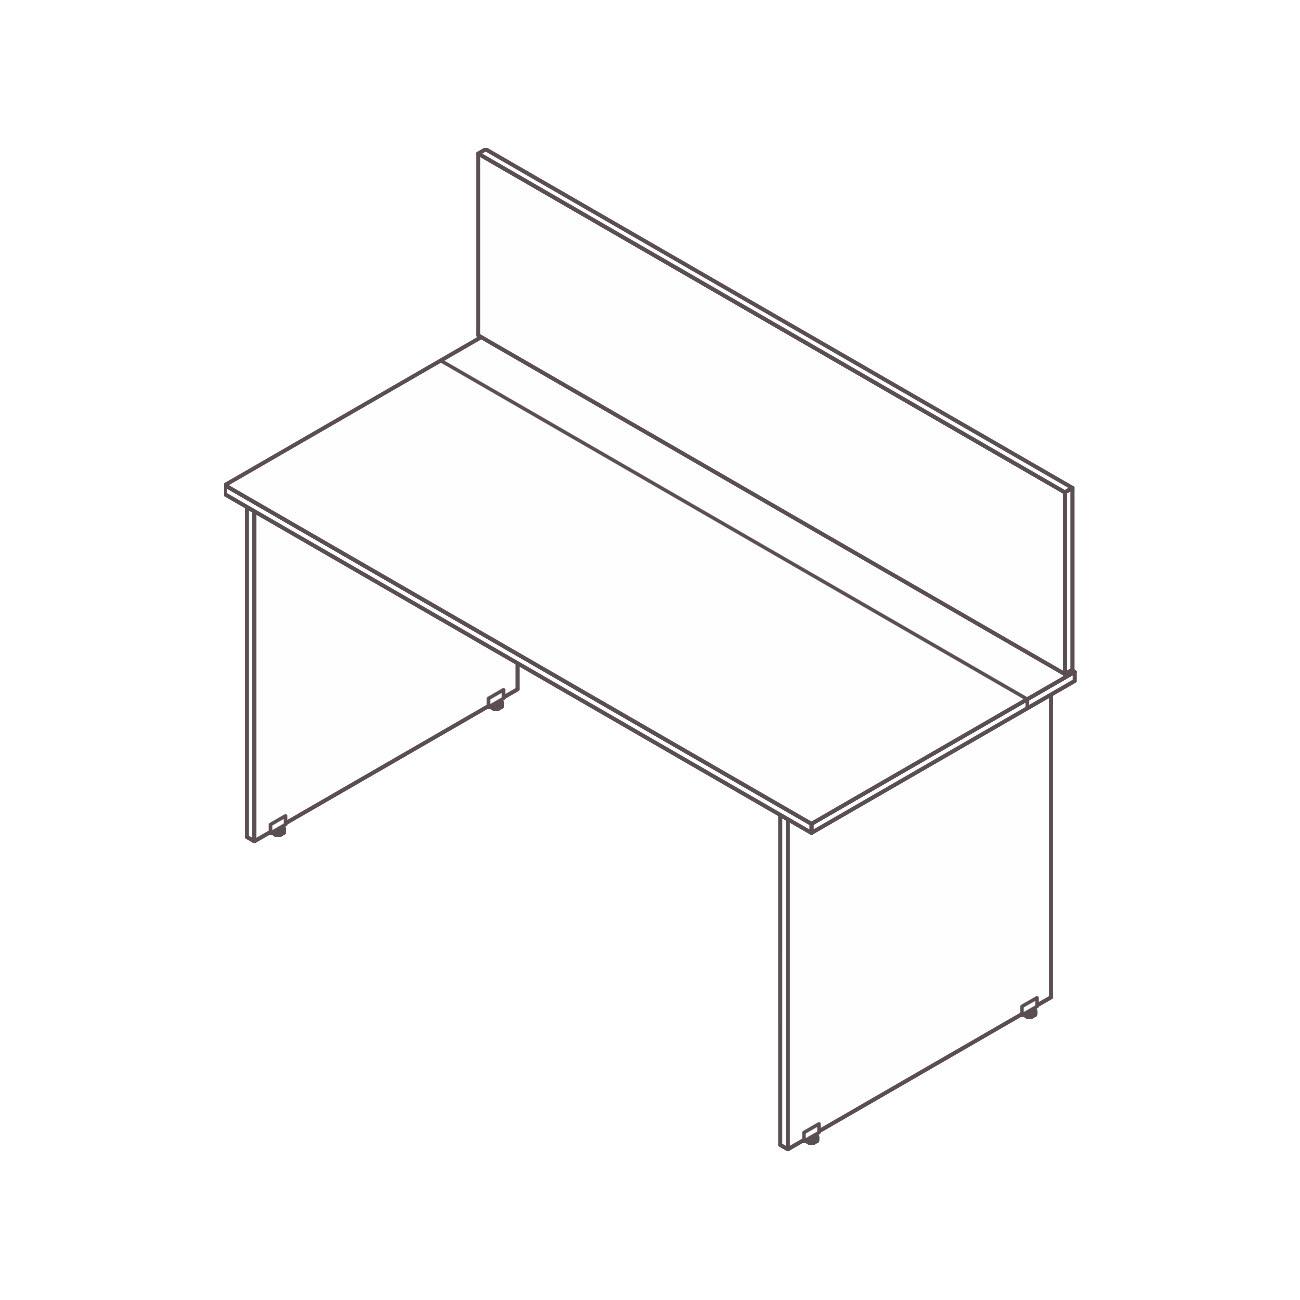 Mesa plataforma individual (passa fio / tomada) diamante